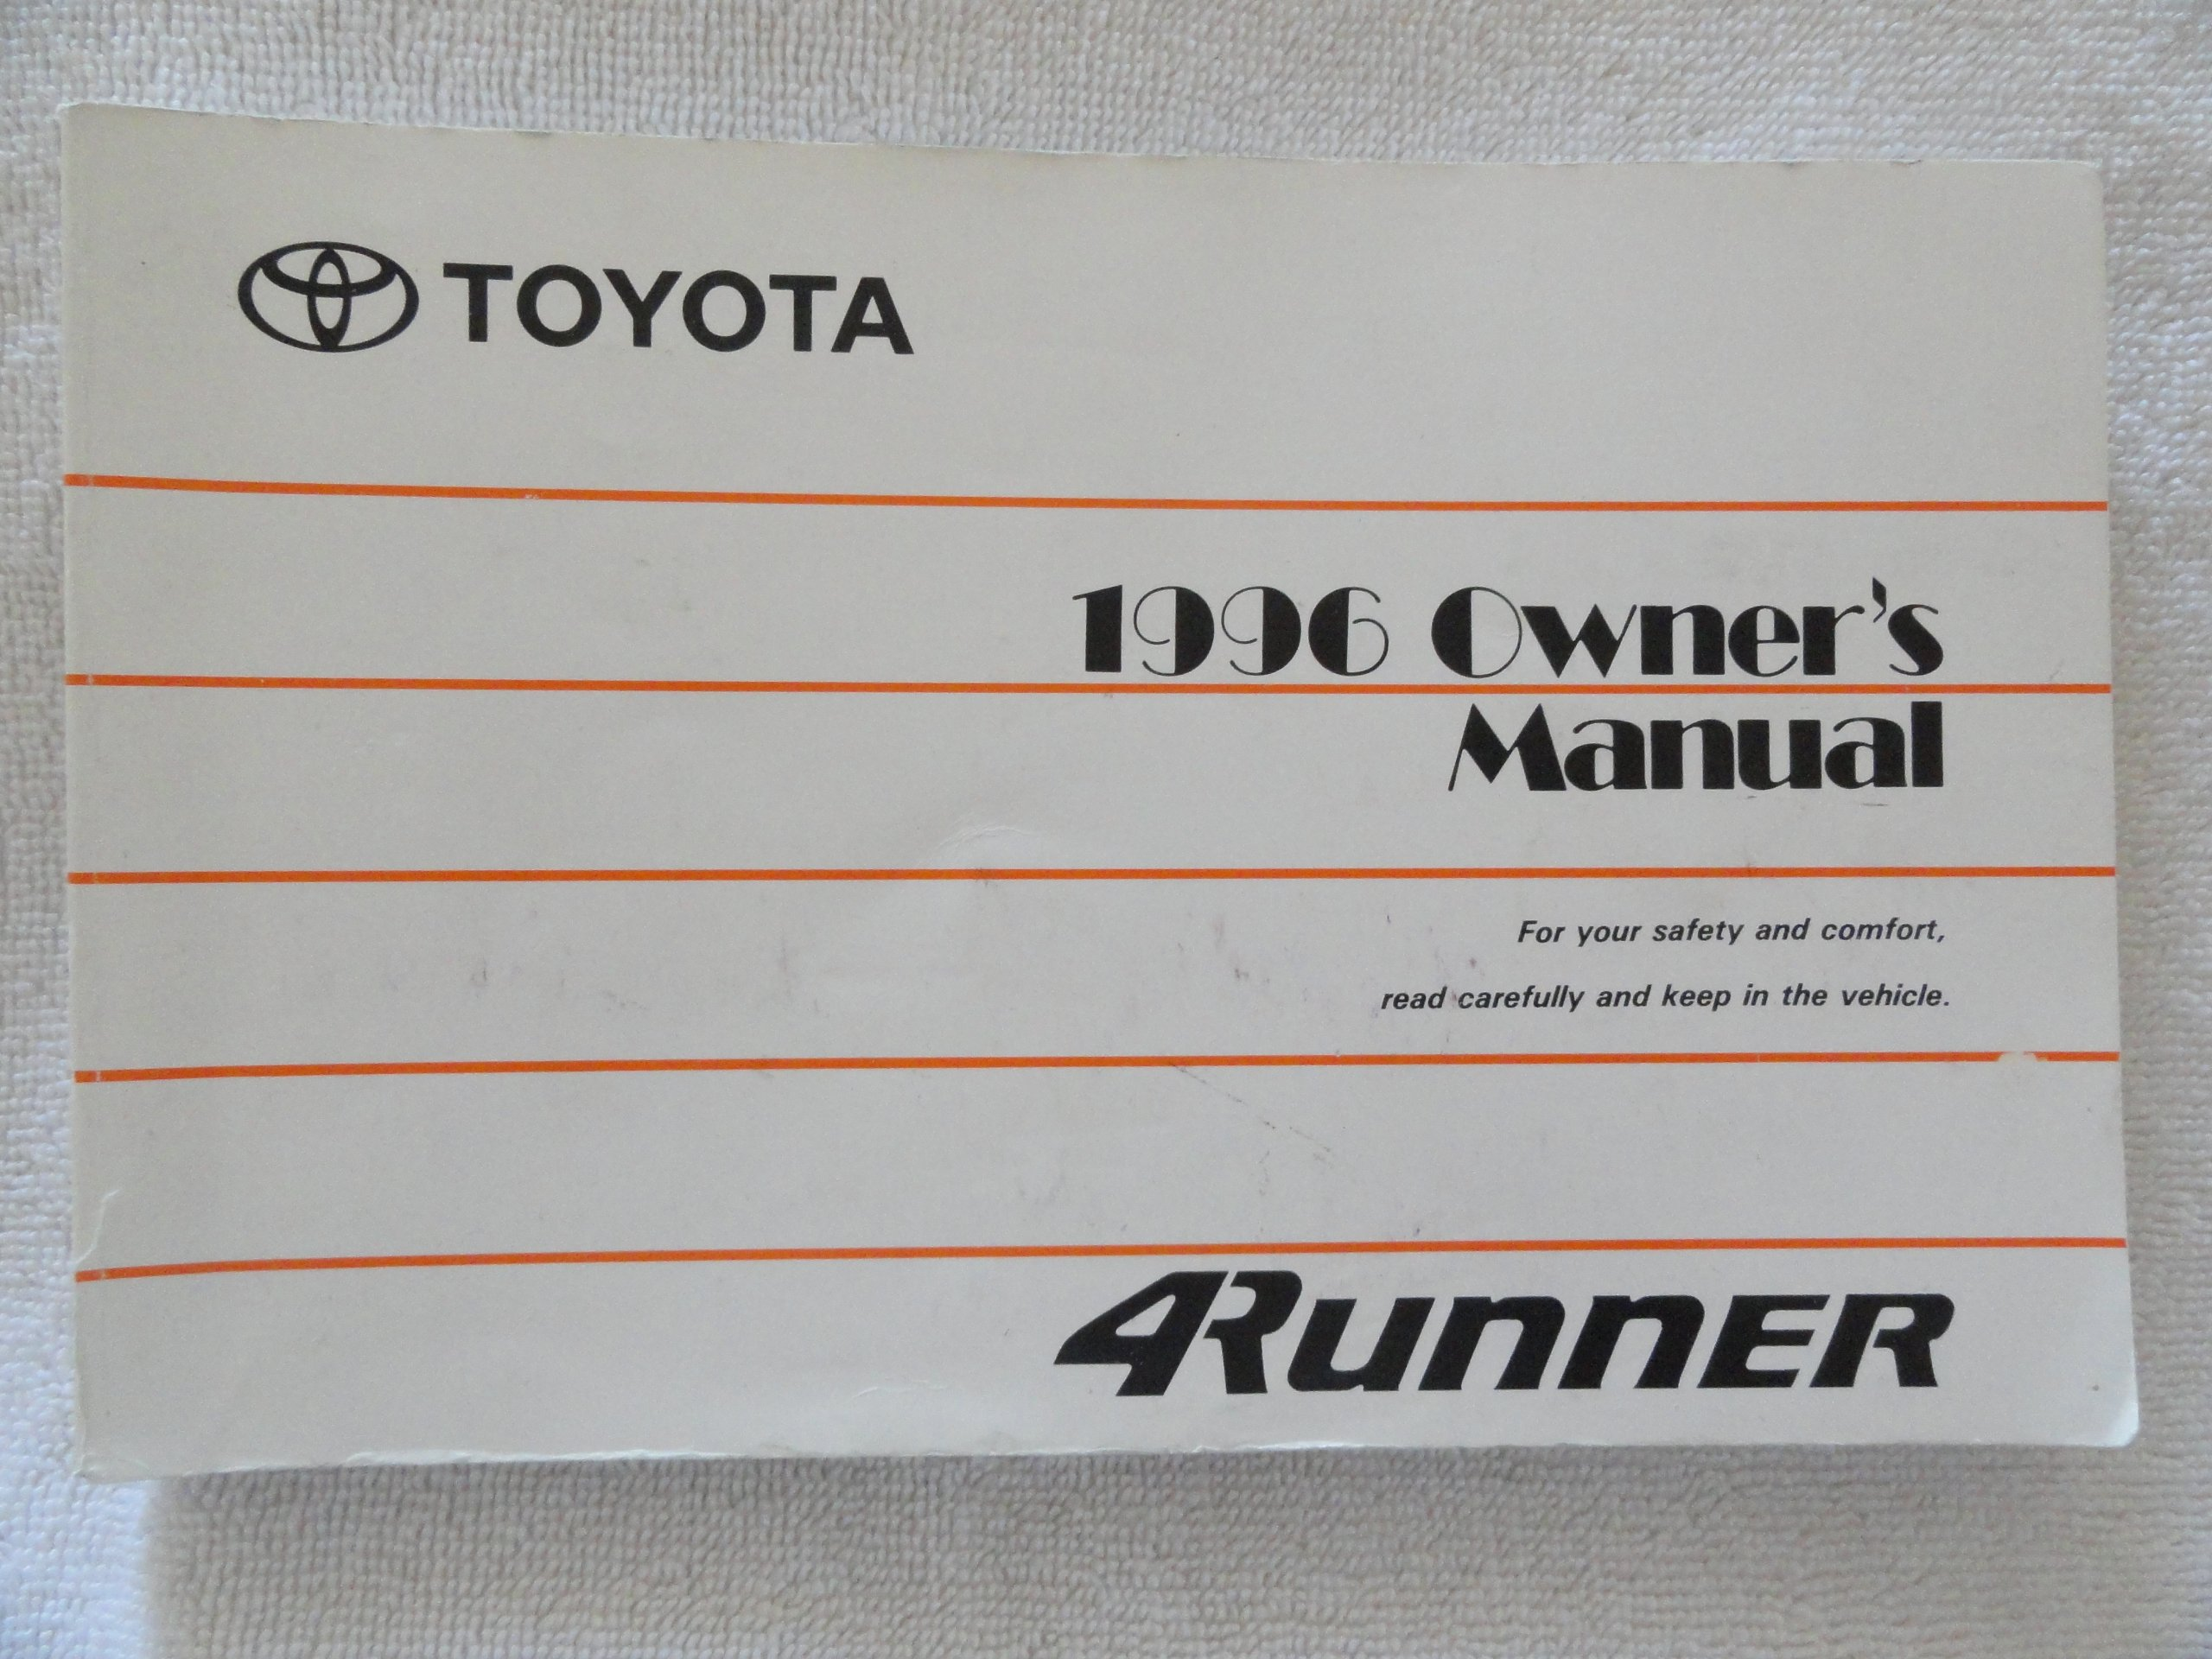 1996 toyota 4runner 4 runner owners manual toyota amazon com books rh amazon com 1995 4Runner 2010 4Runner